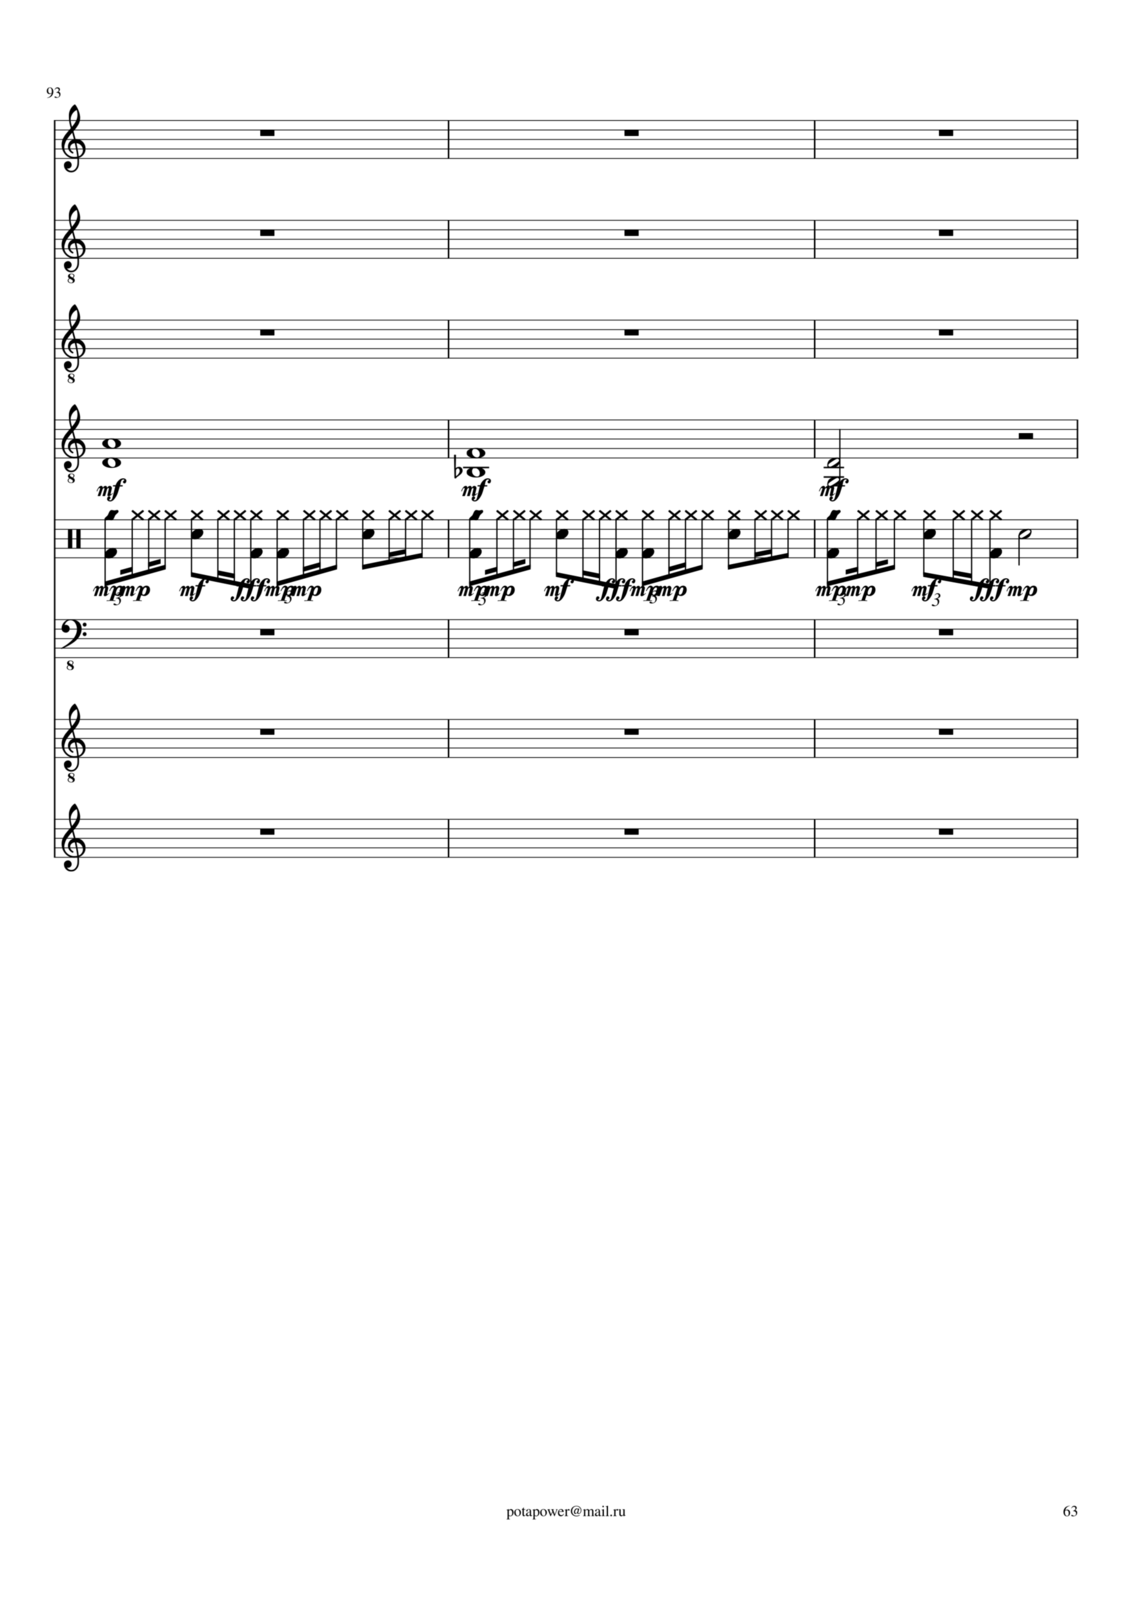 Korolevstvo slez slide, Image 63